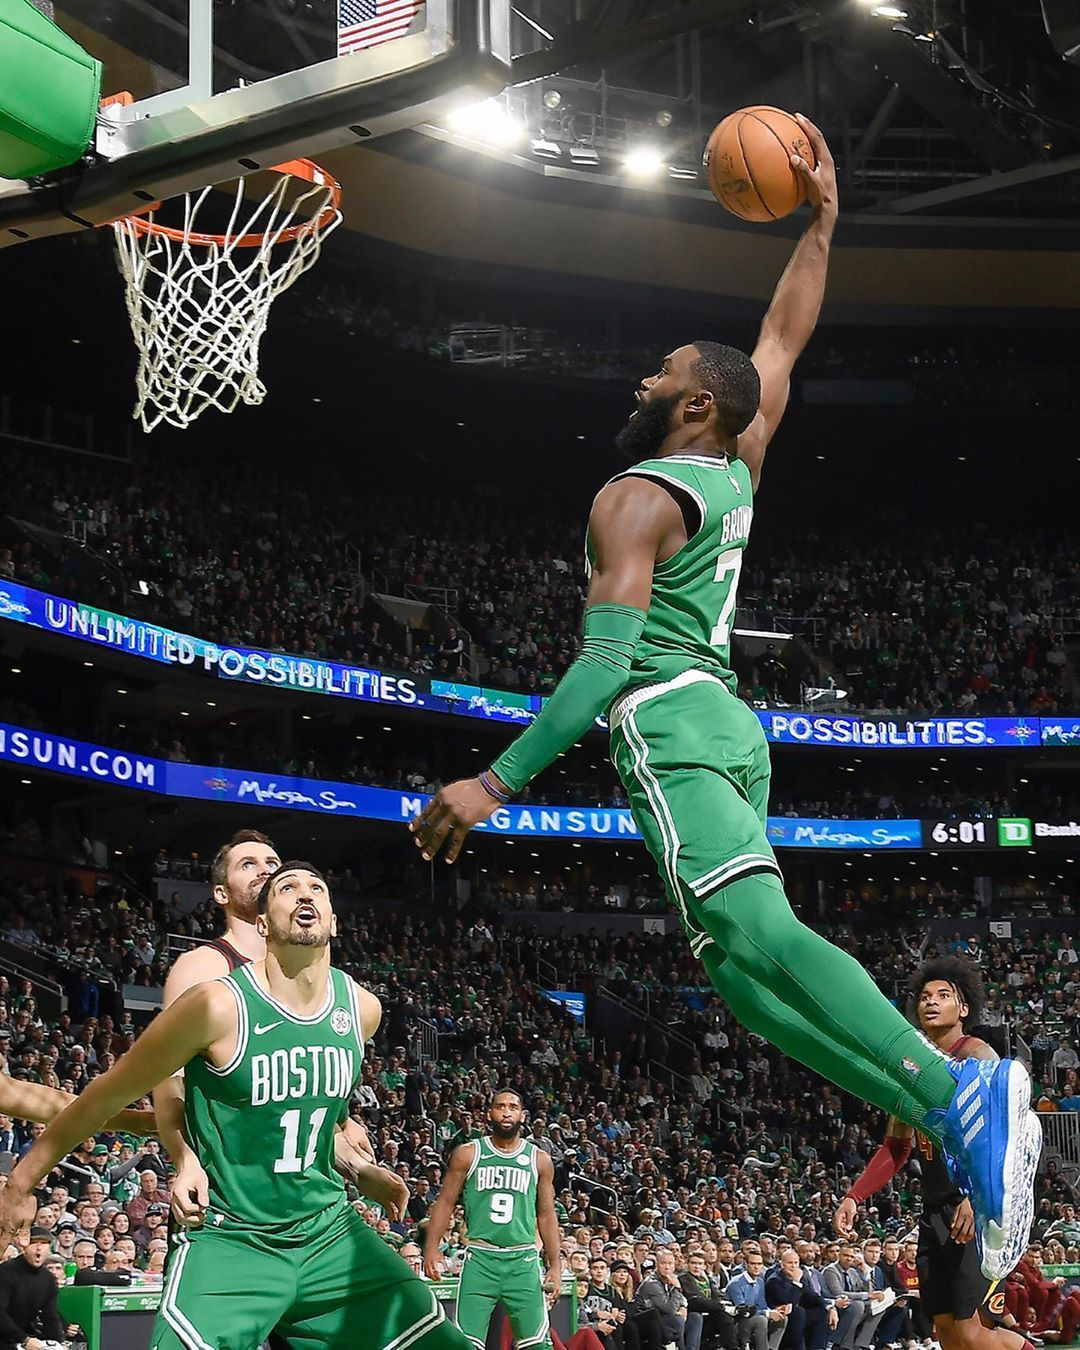 Slam X Kicks On Instagram Jaylen Going Green To Blue Green To Blue Boston Celtics Nba Wallpapers